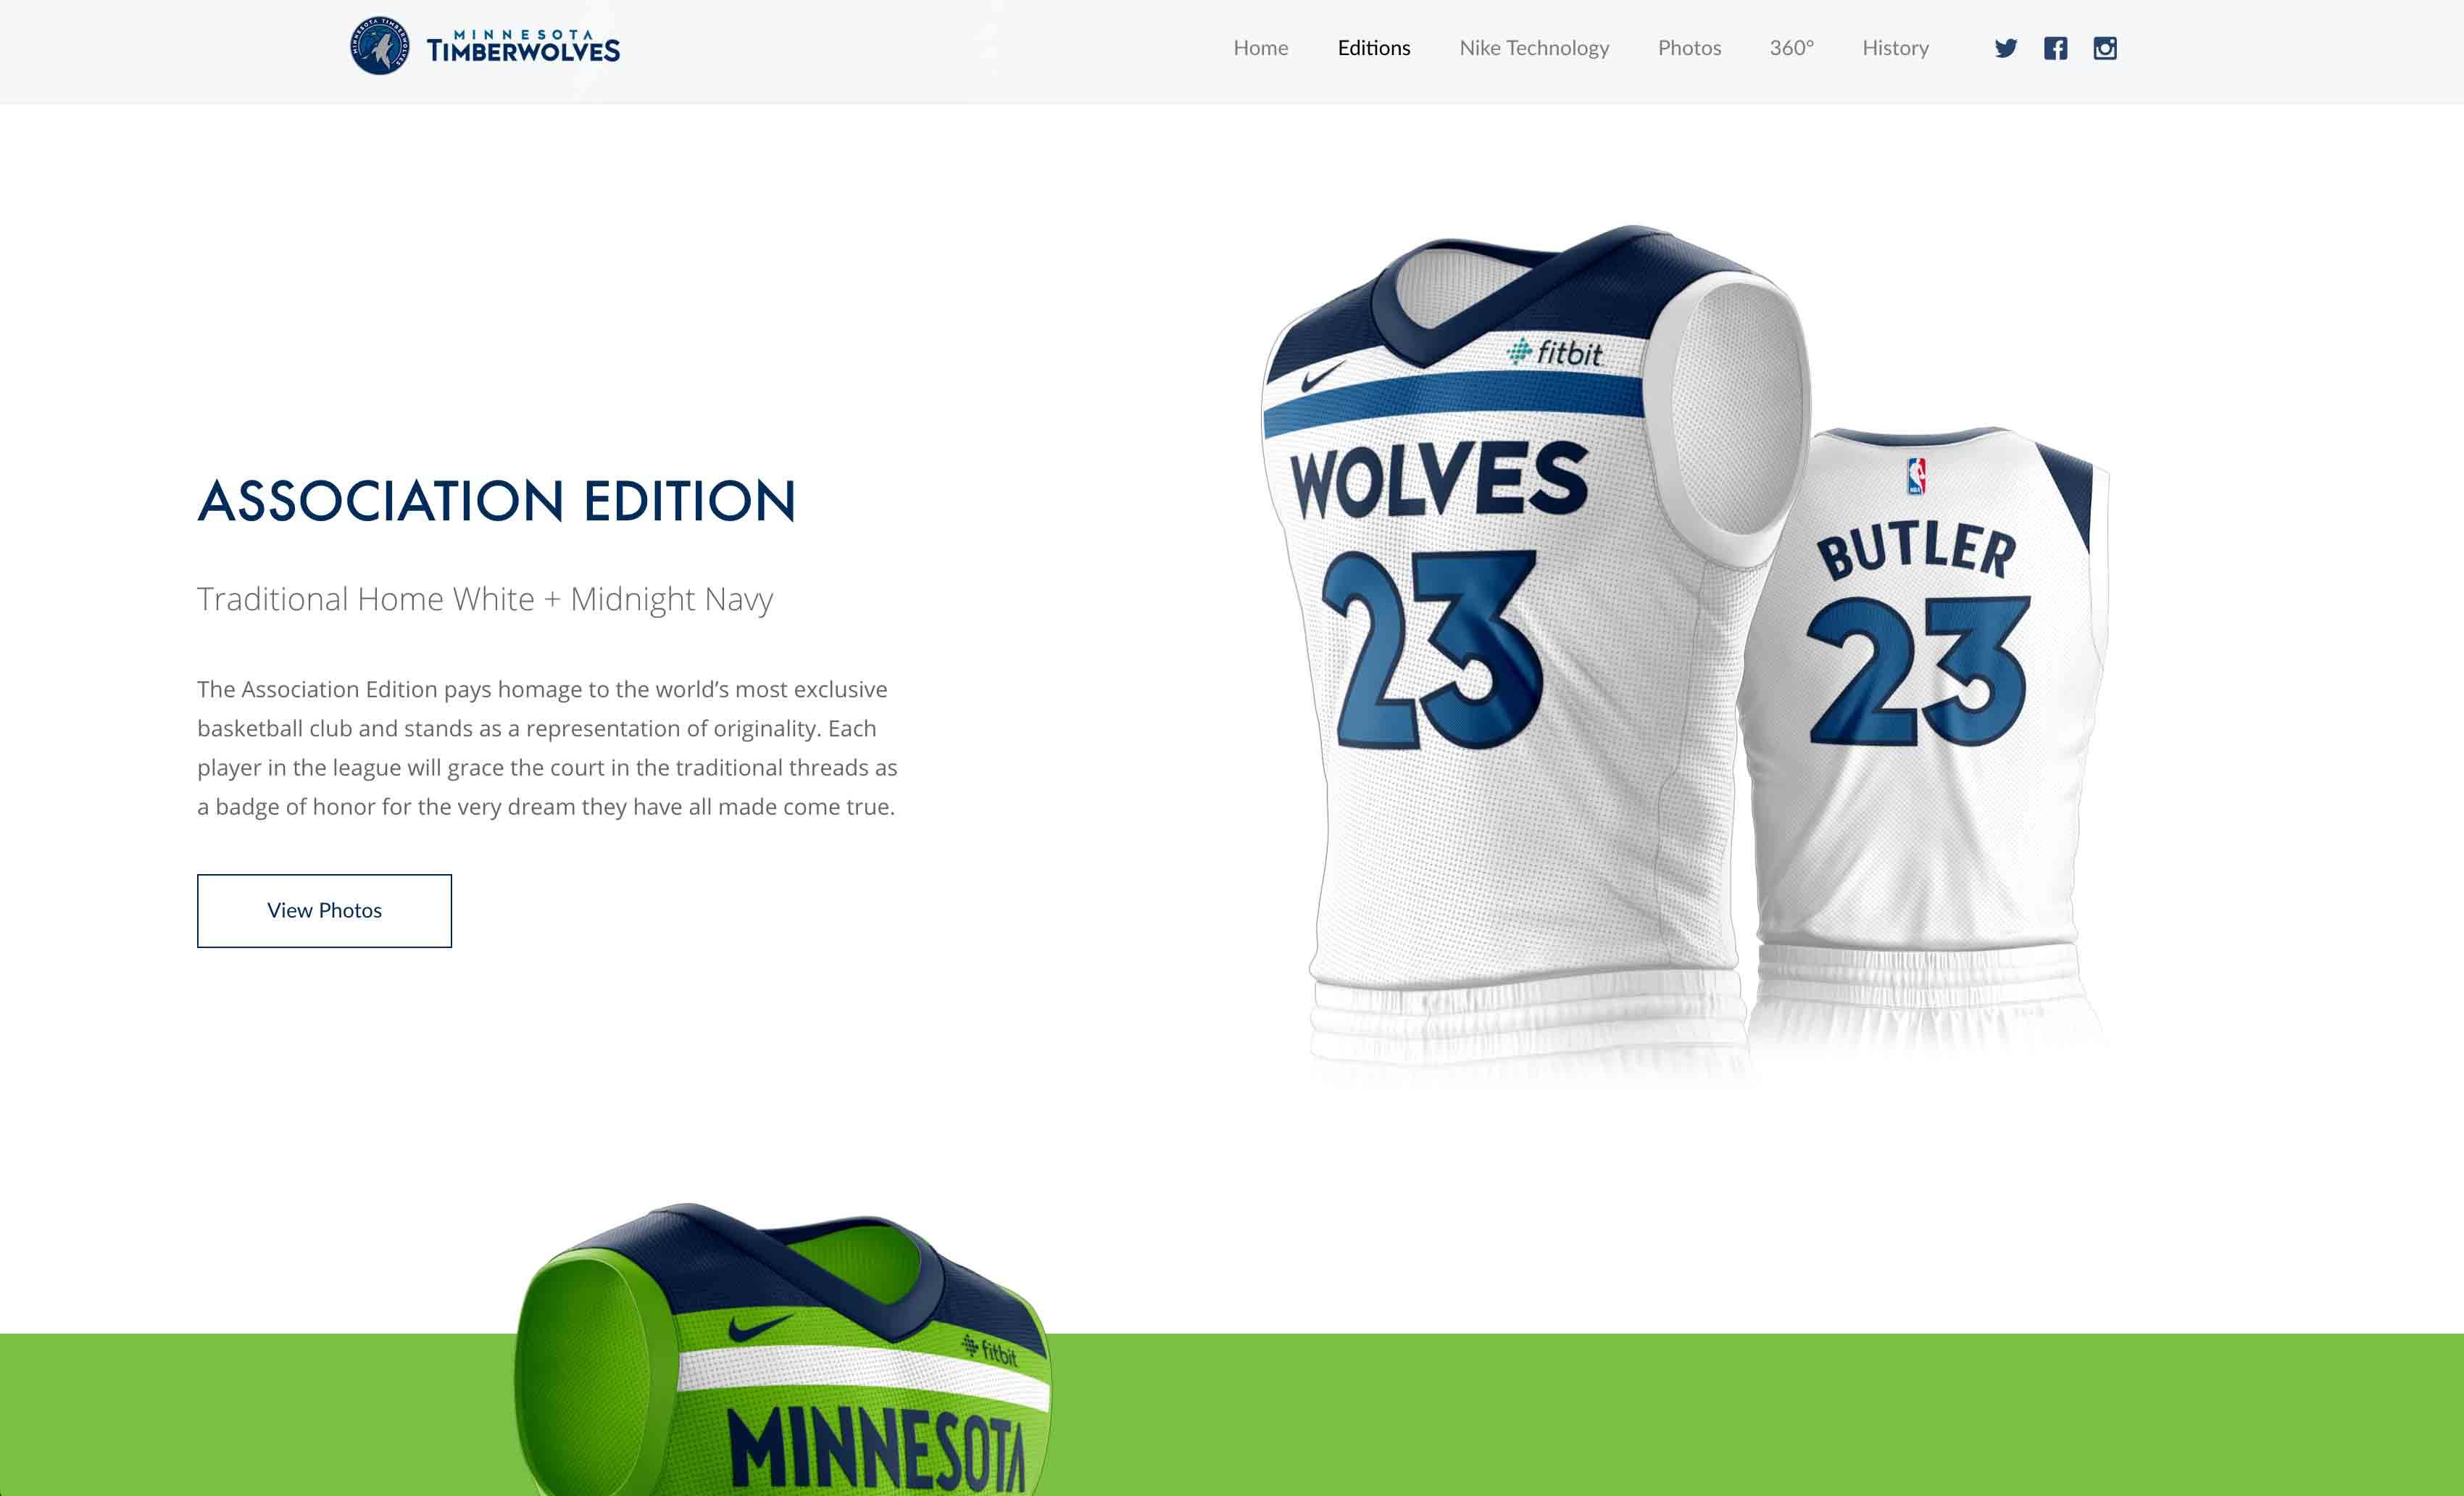 304191f6604 ... MN Timberwolves New Threads Project  Desktop View